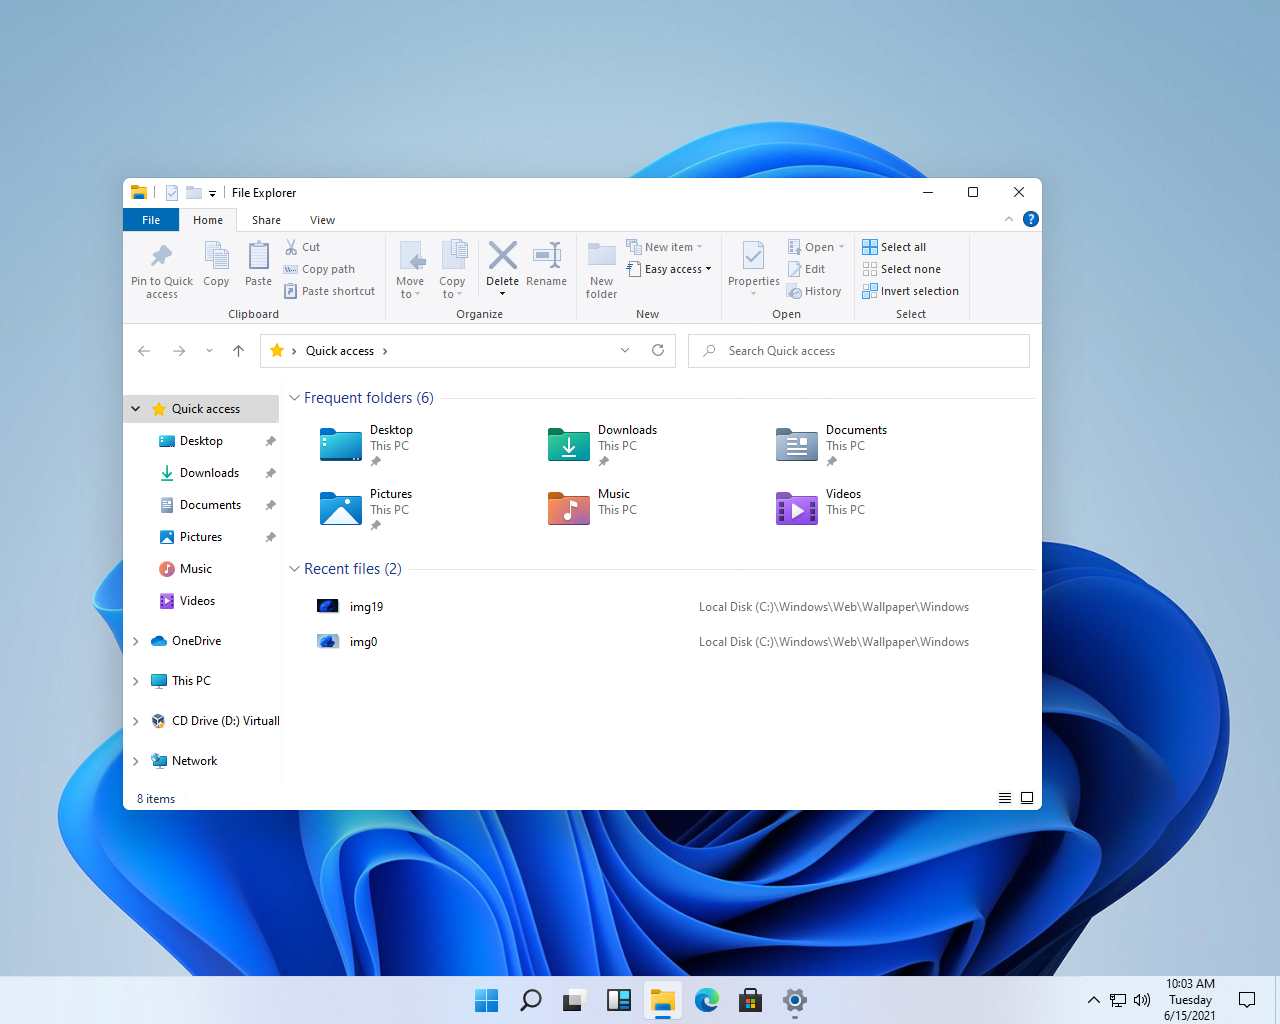 ui3.png 윈도우 11 유출 버전 인터페이스